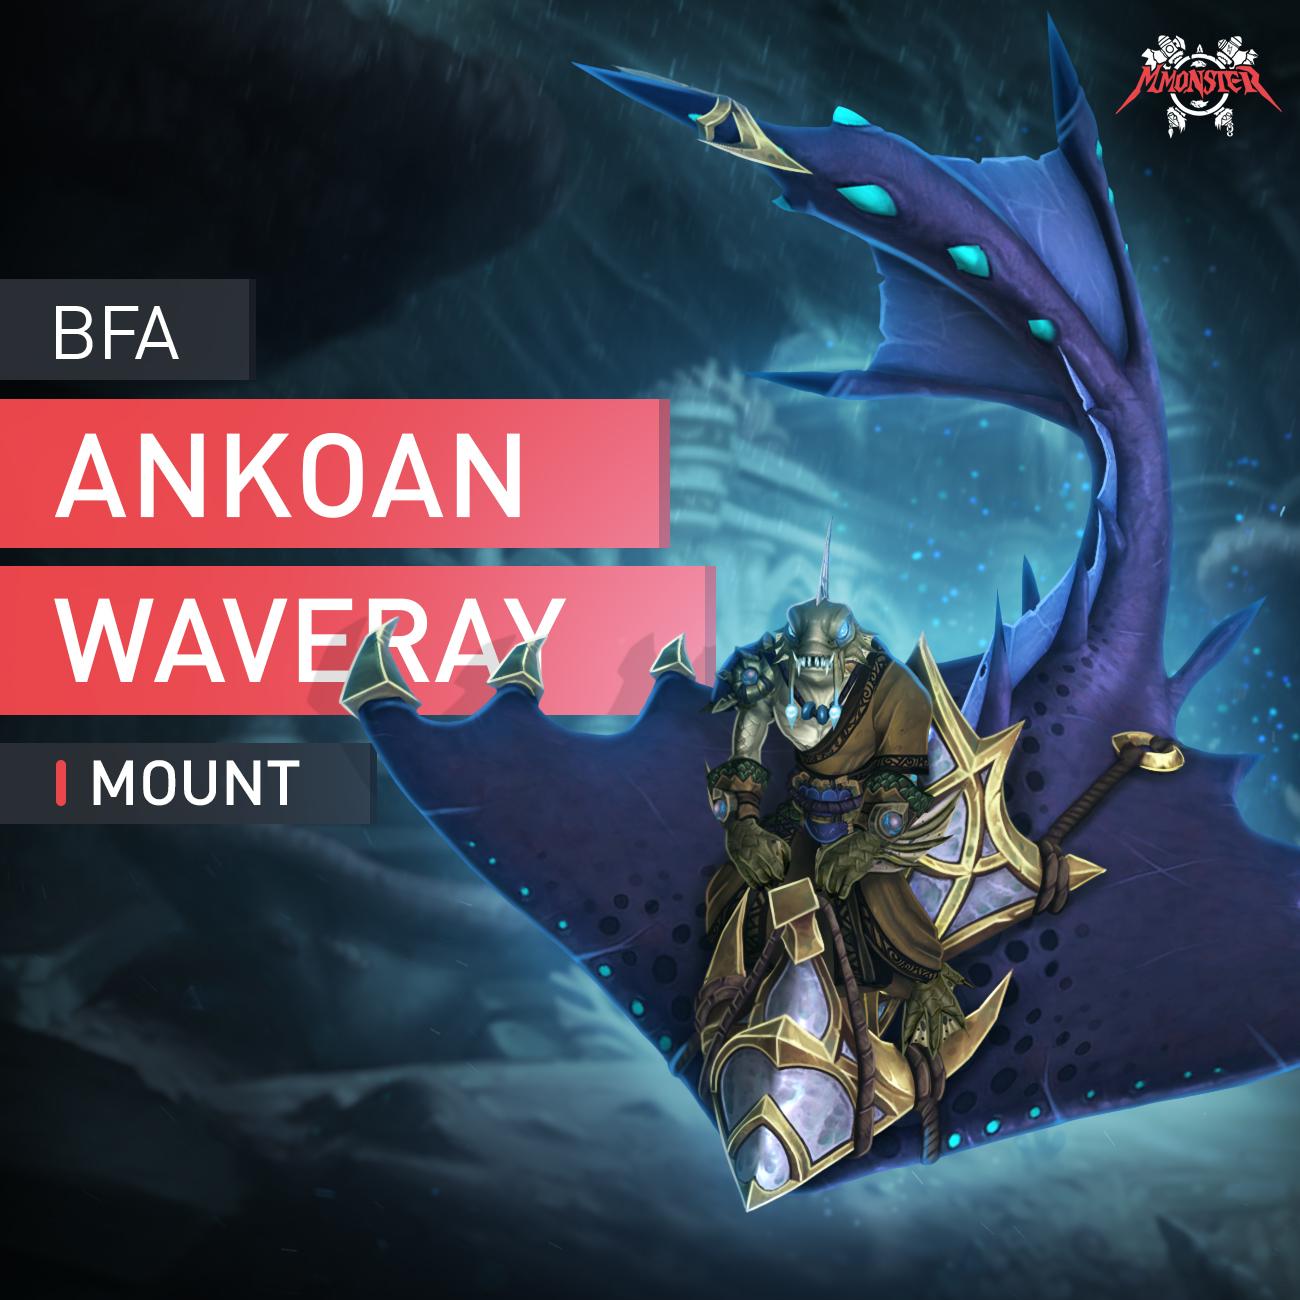 Ankoan Waveray Mount